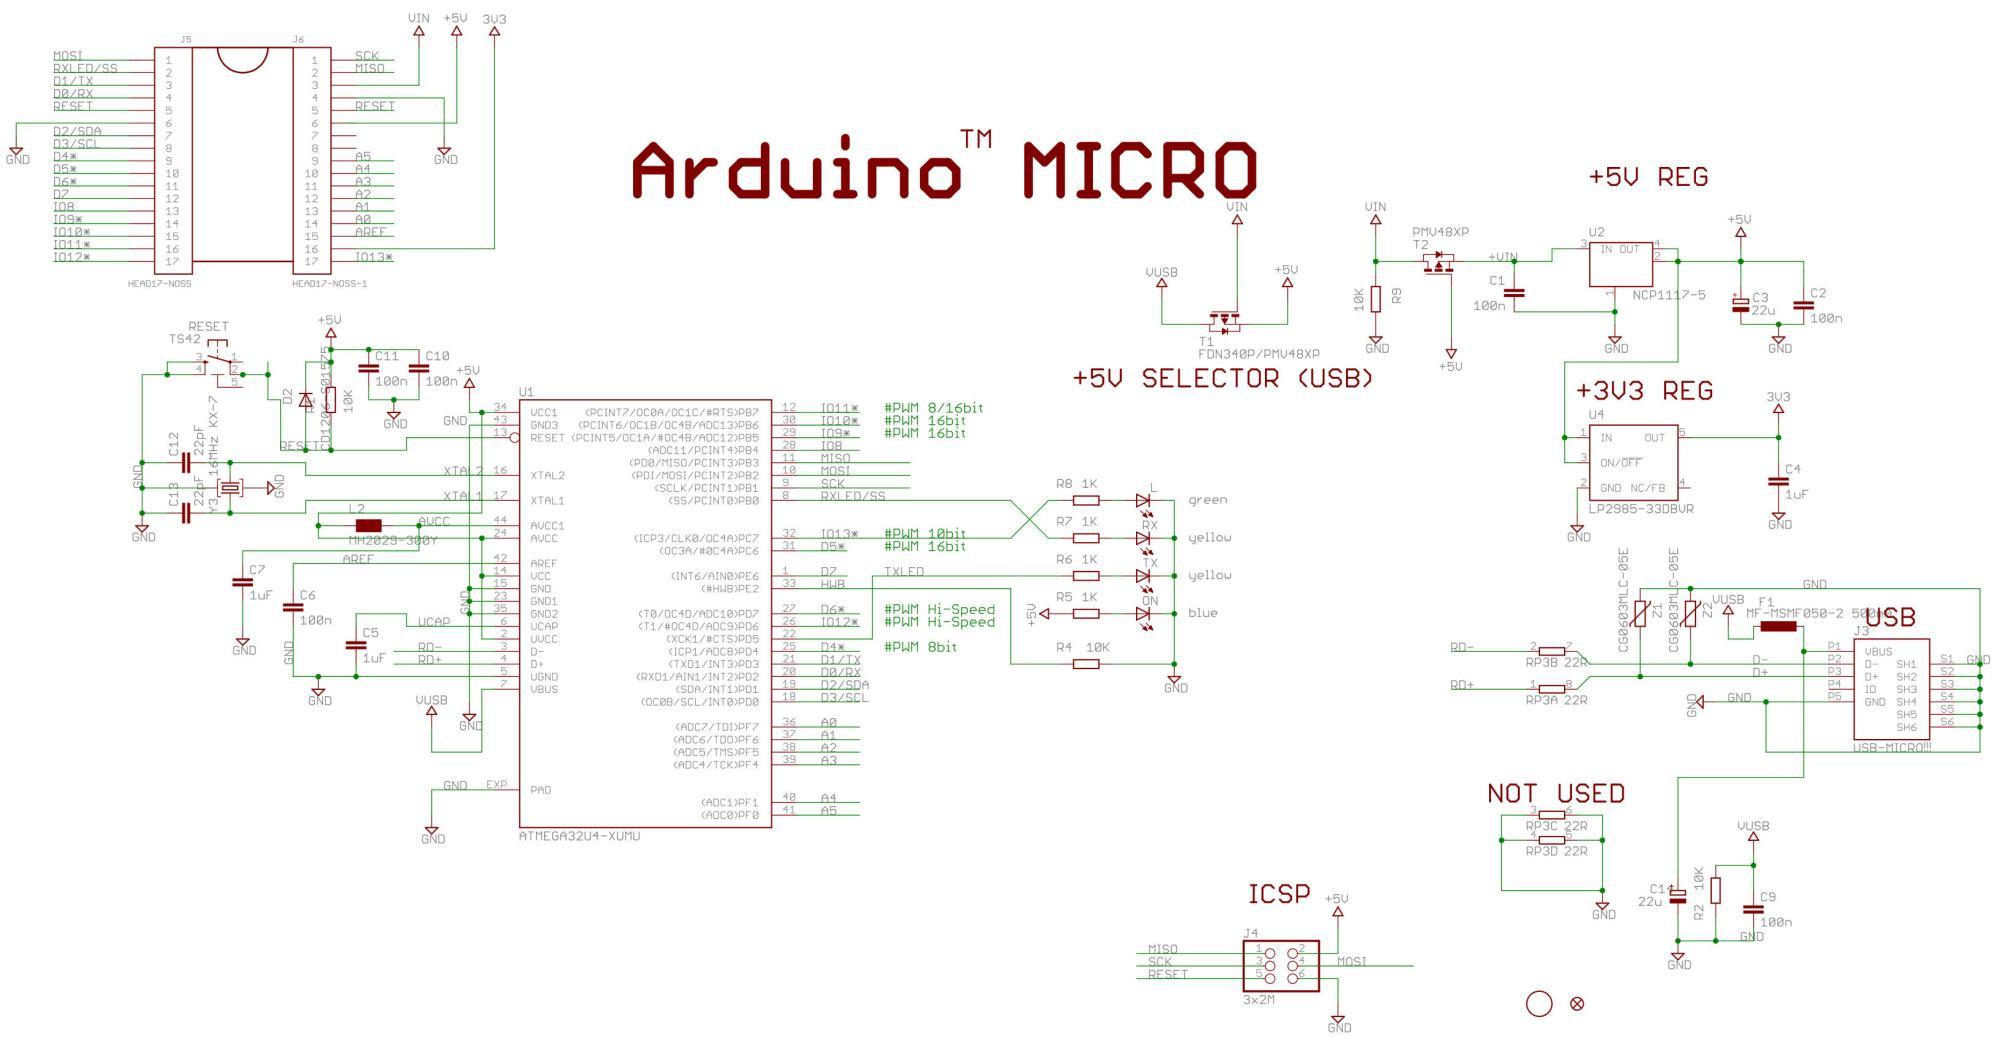 hight resolution of arduino micro schematic